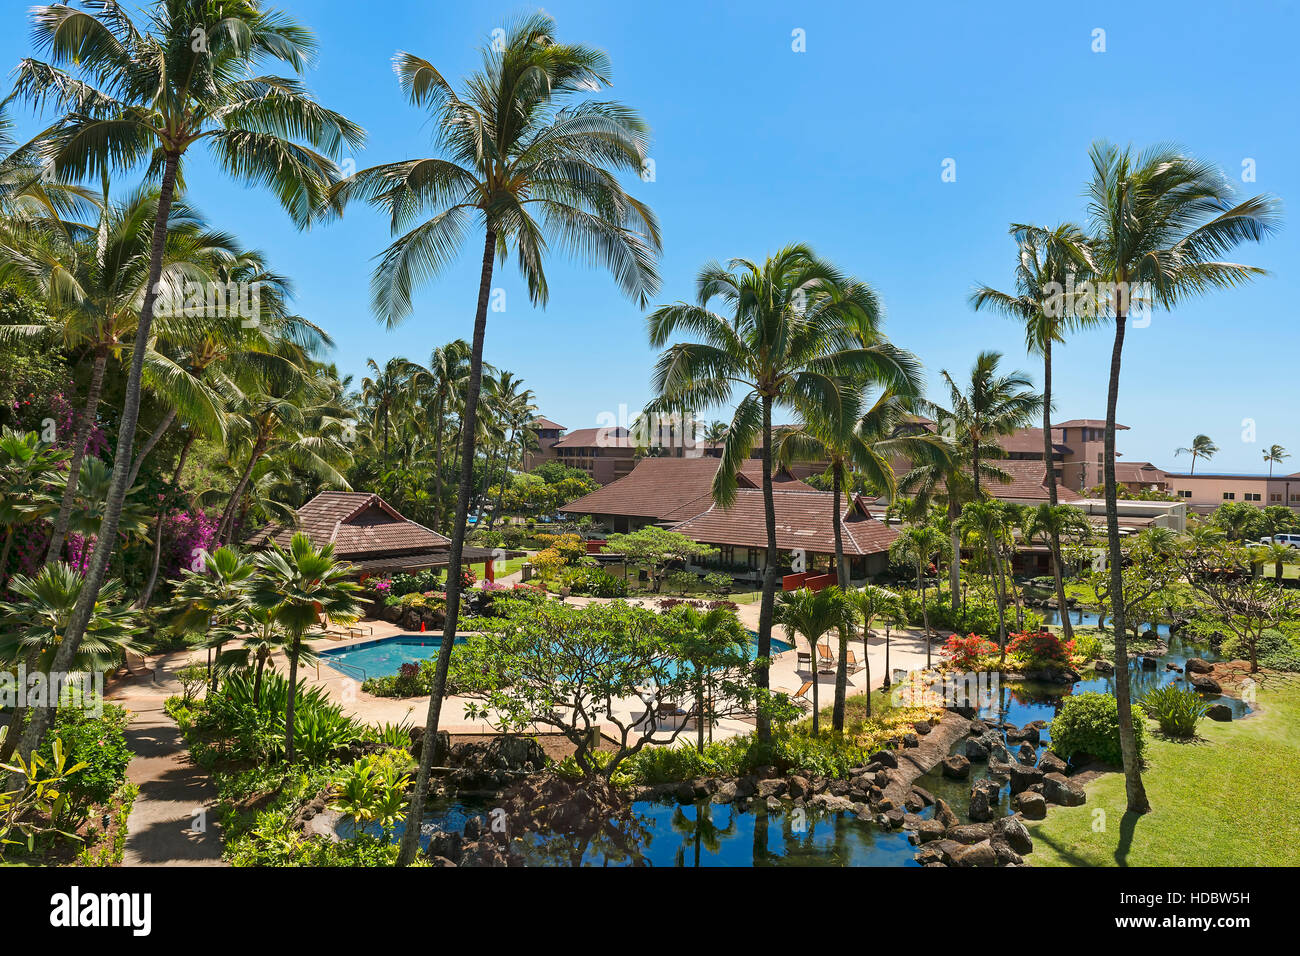 Hotelanlage mit Pool und Palmen, Poipu, Koloa, Kaua ' i, Hawaii, USA Stockbild